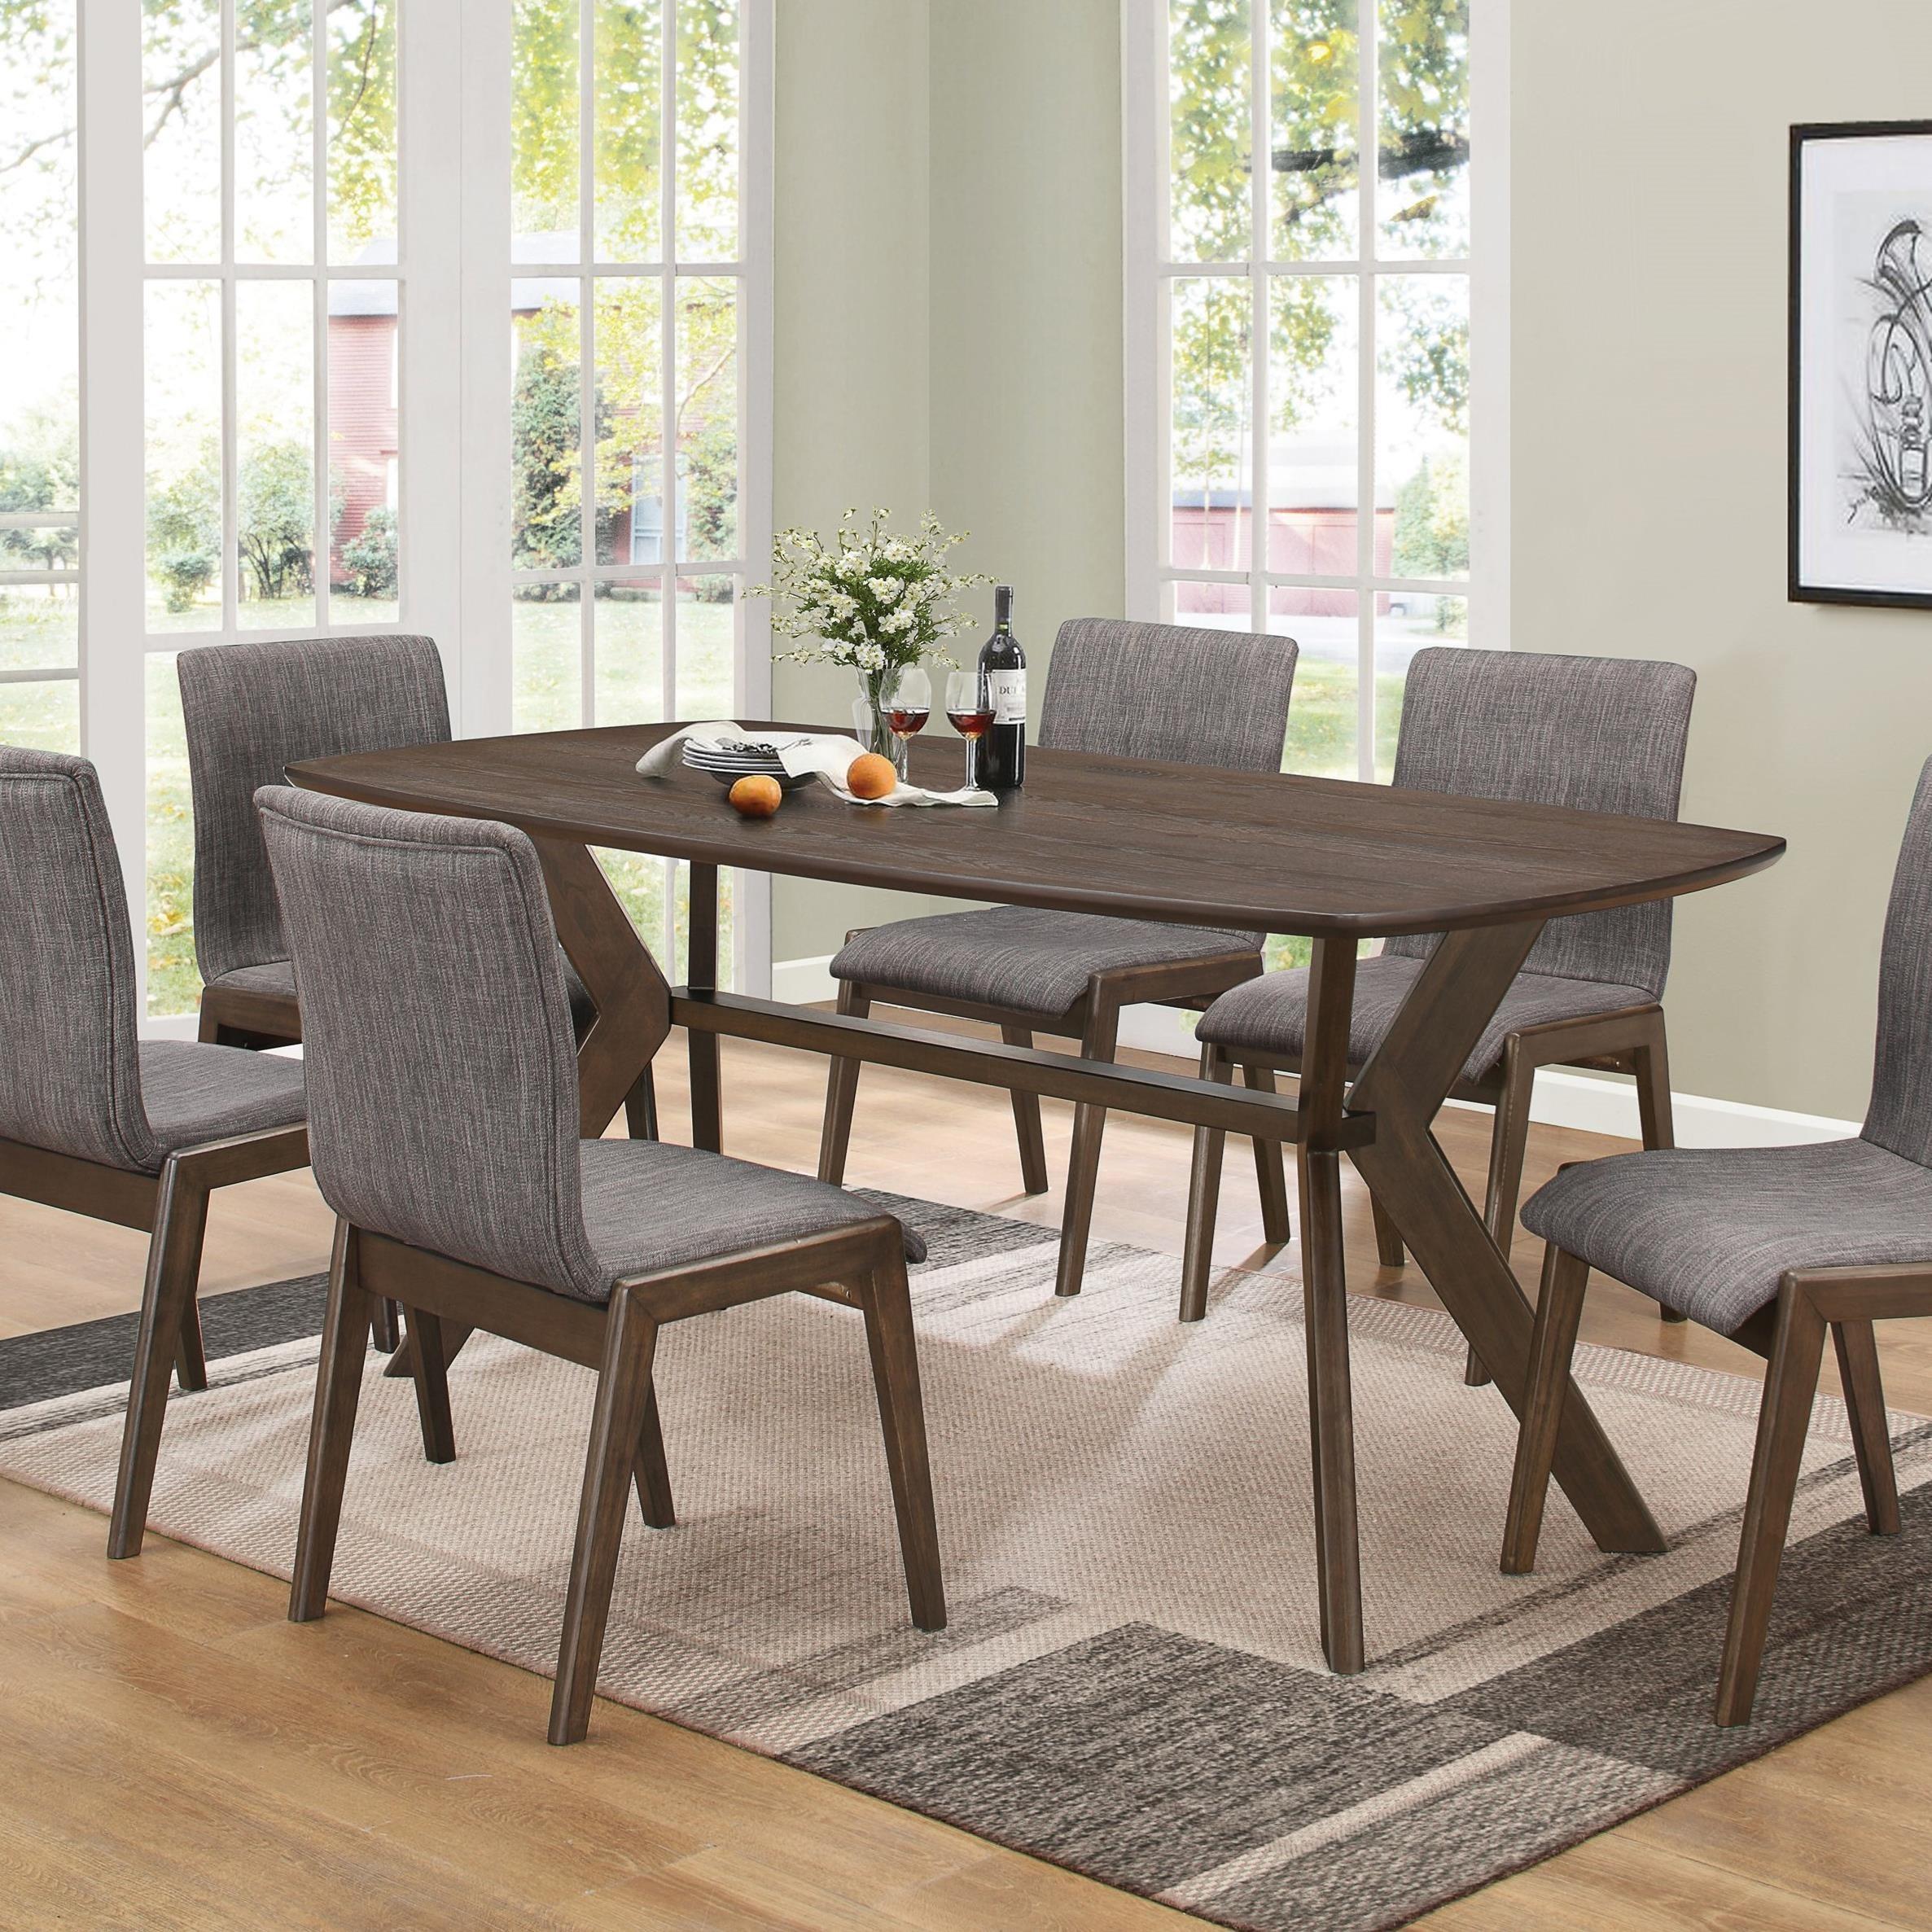 Mcbride Coaster Retro Dining Room Table City